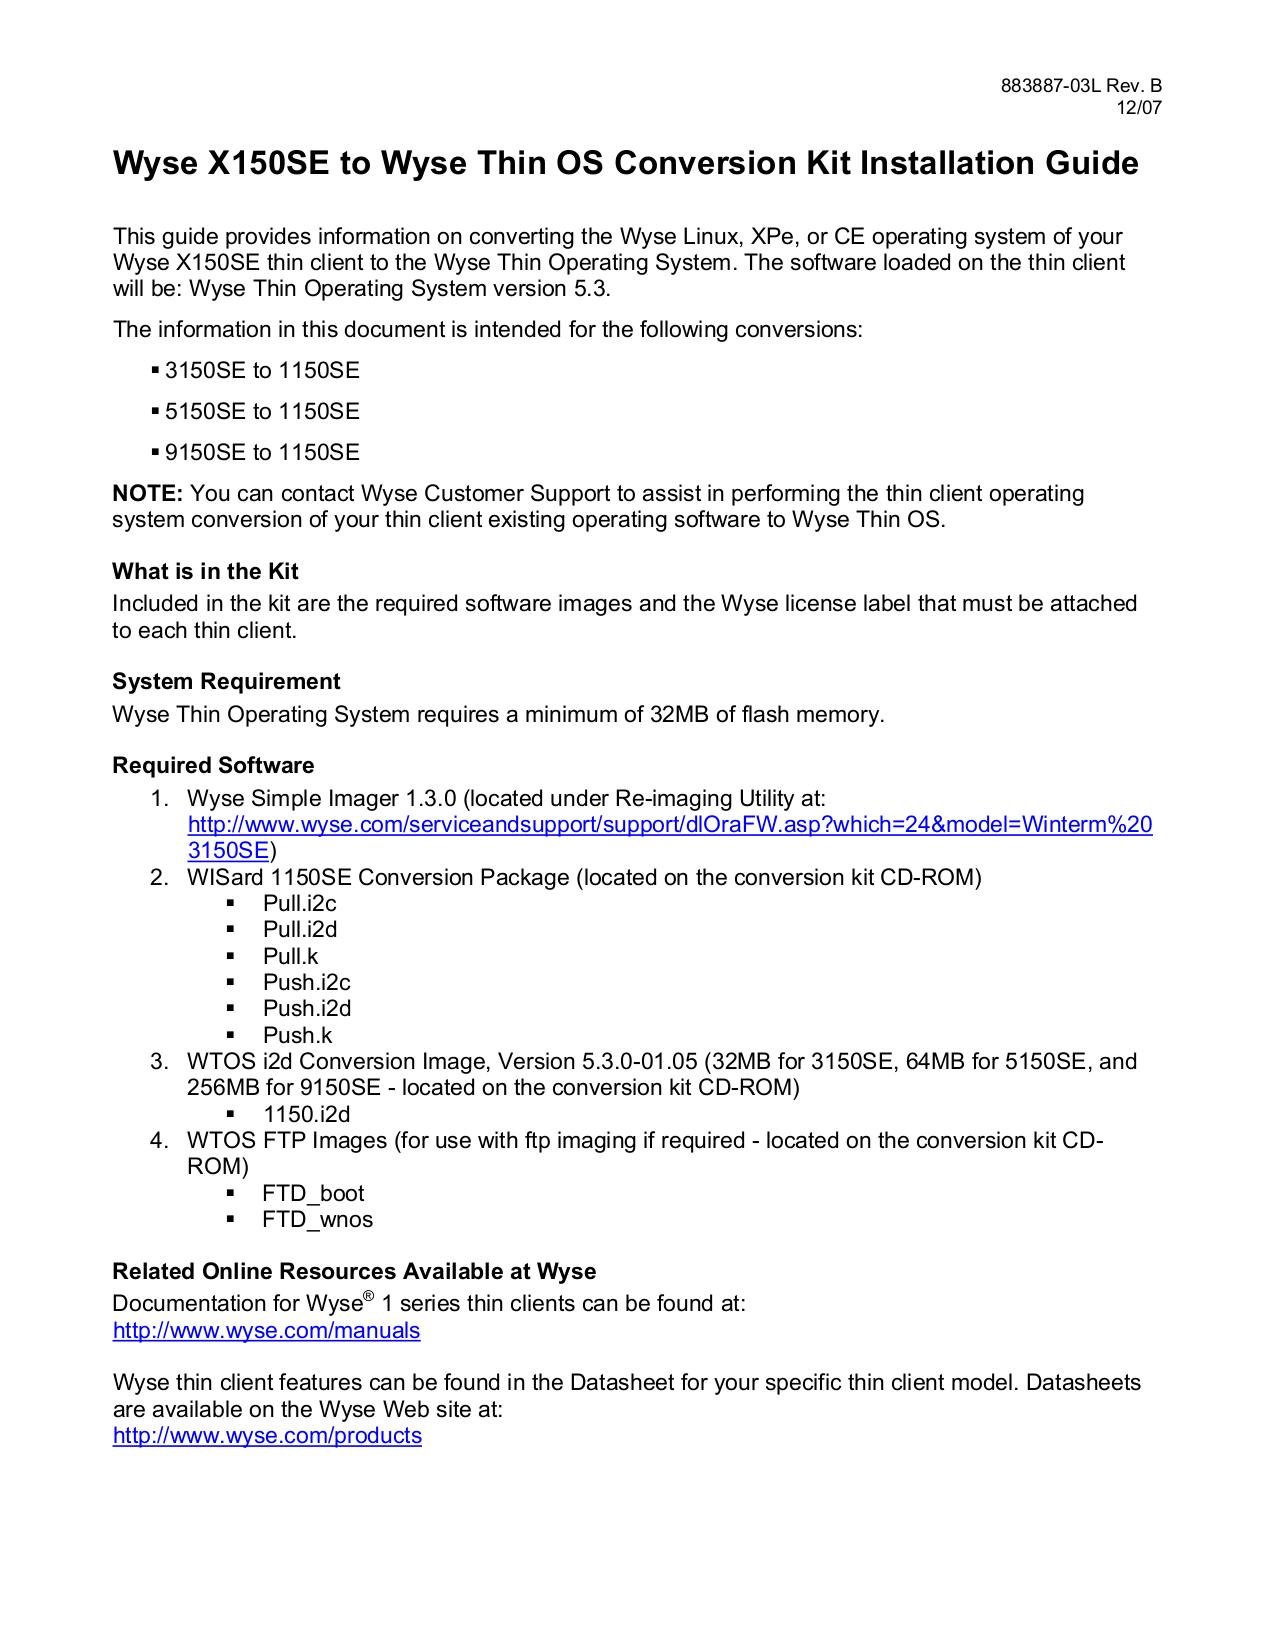 PDF manual for Wyse Desktop Winterm 3150SE